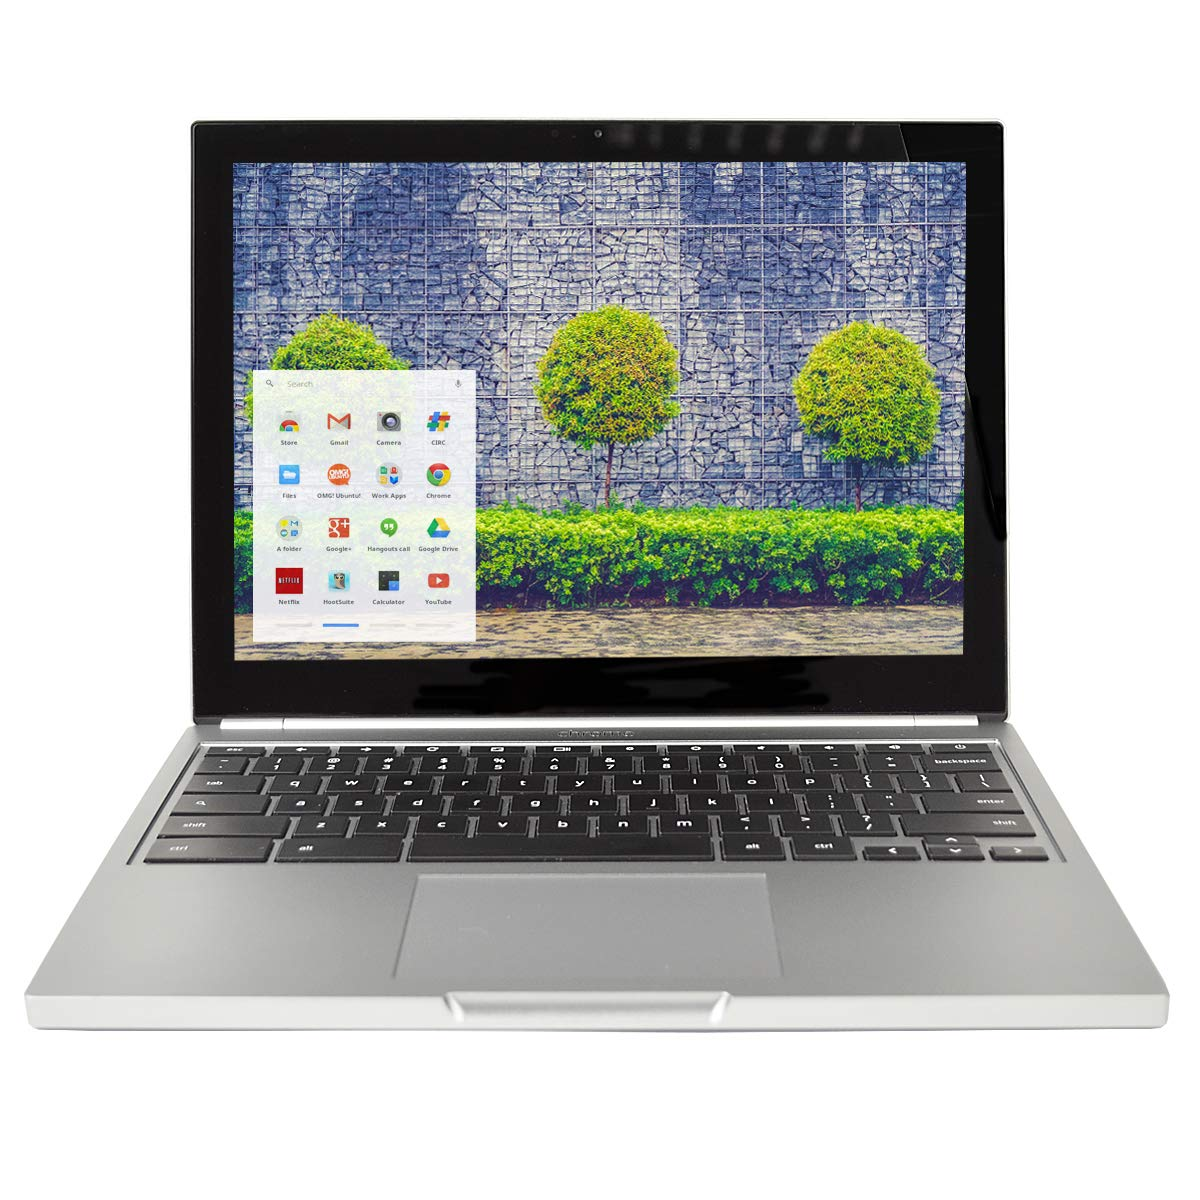 Google Chromebook Pixel C1501W 2015 (64GB SSD - 16GB RAM) - Wi-Fi Touch  Screen Laptop - International Version - No Warranty (Gray)